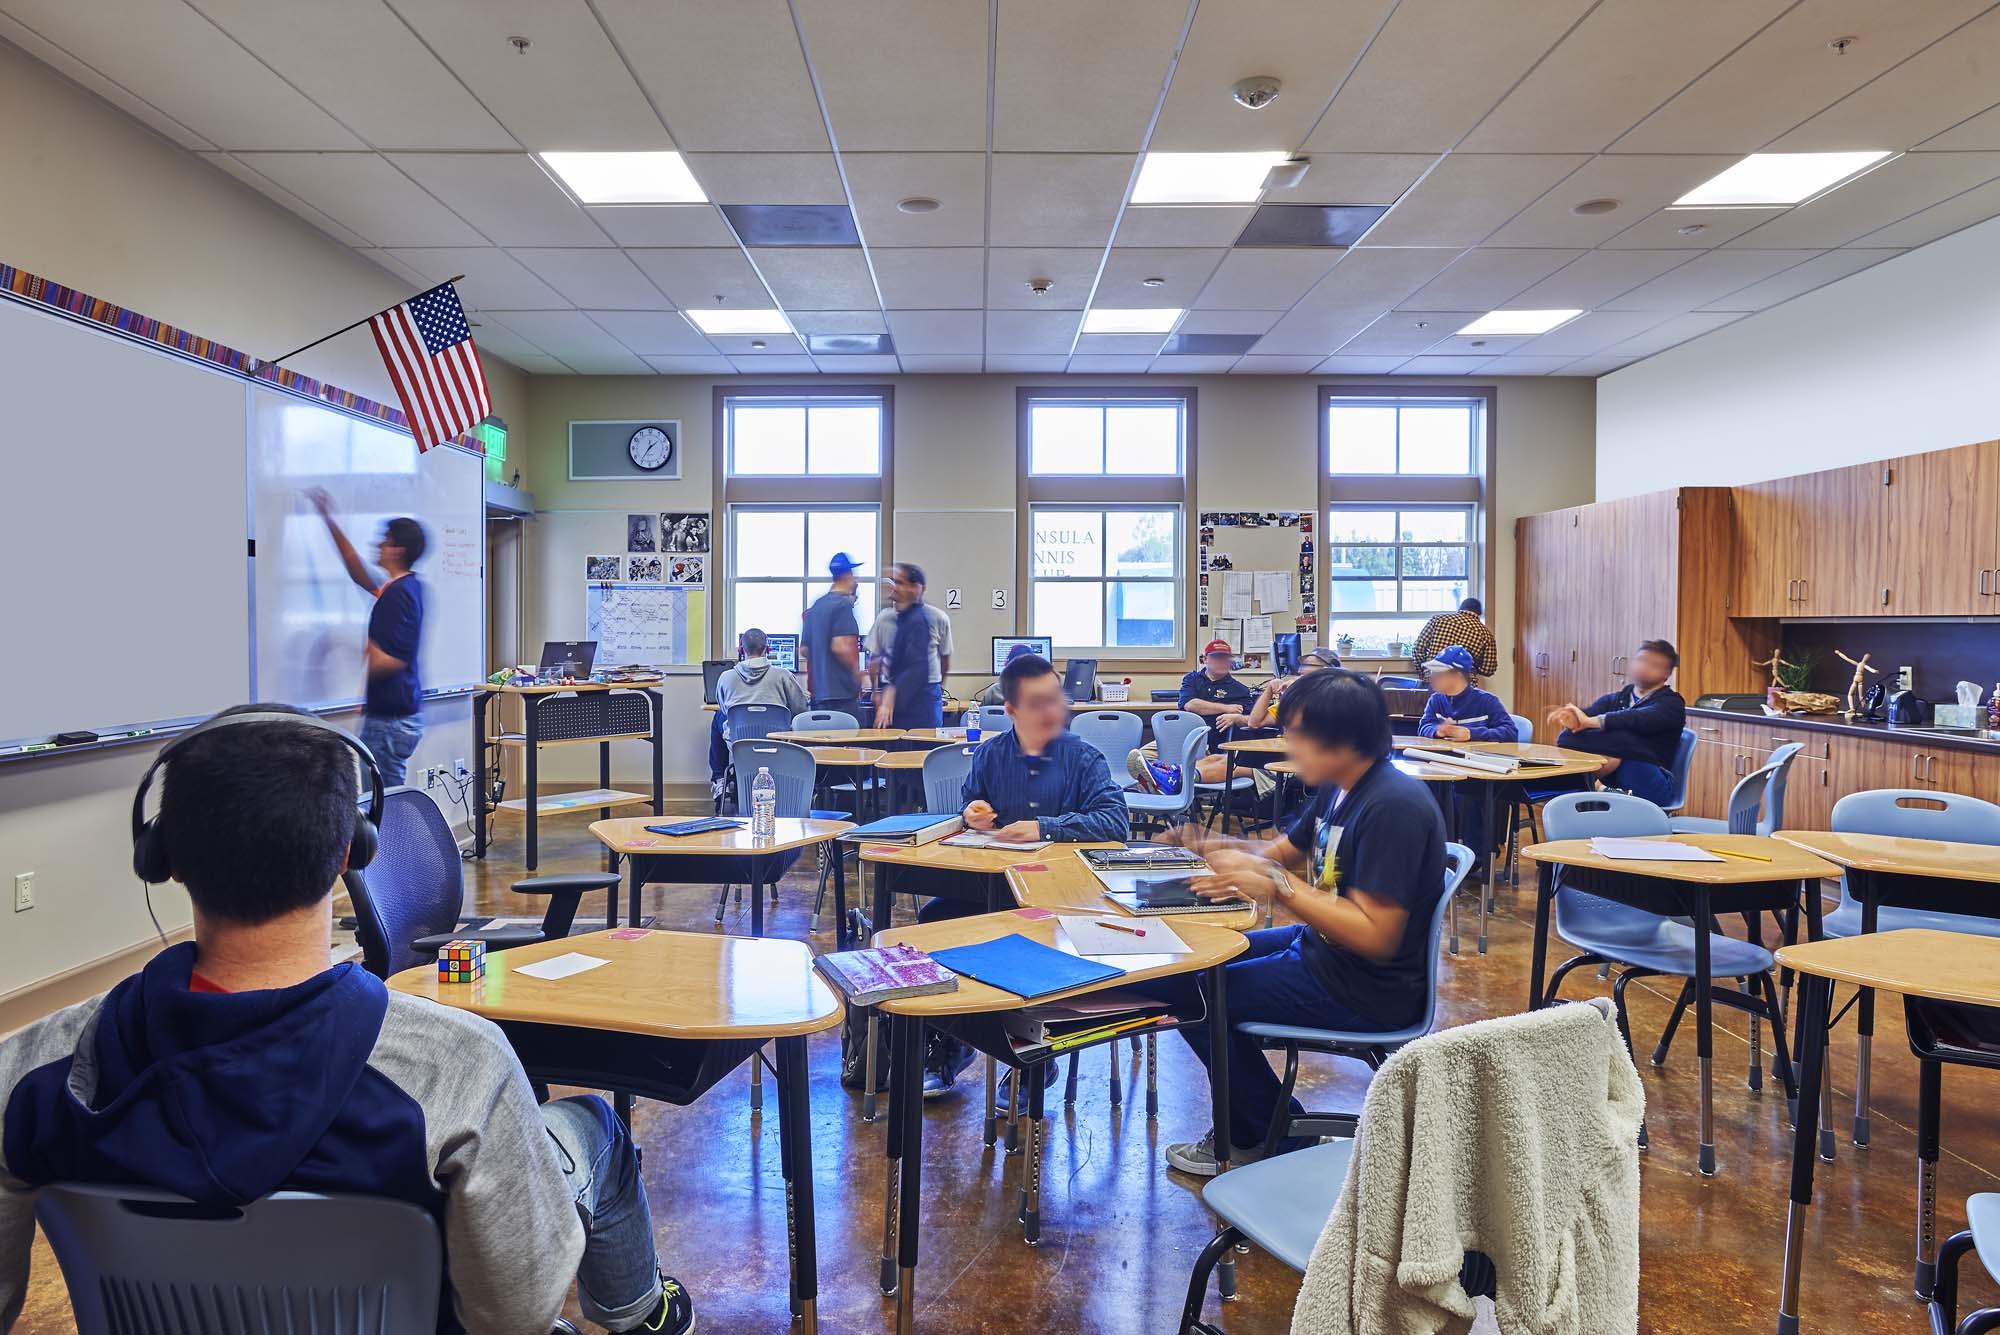 Artik Burlingame High School